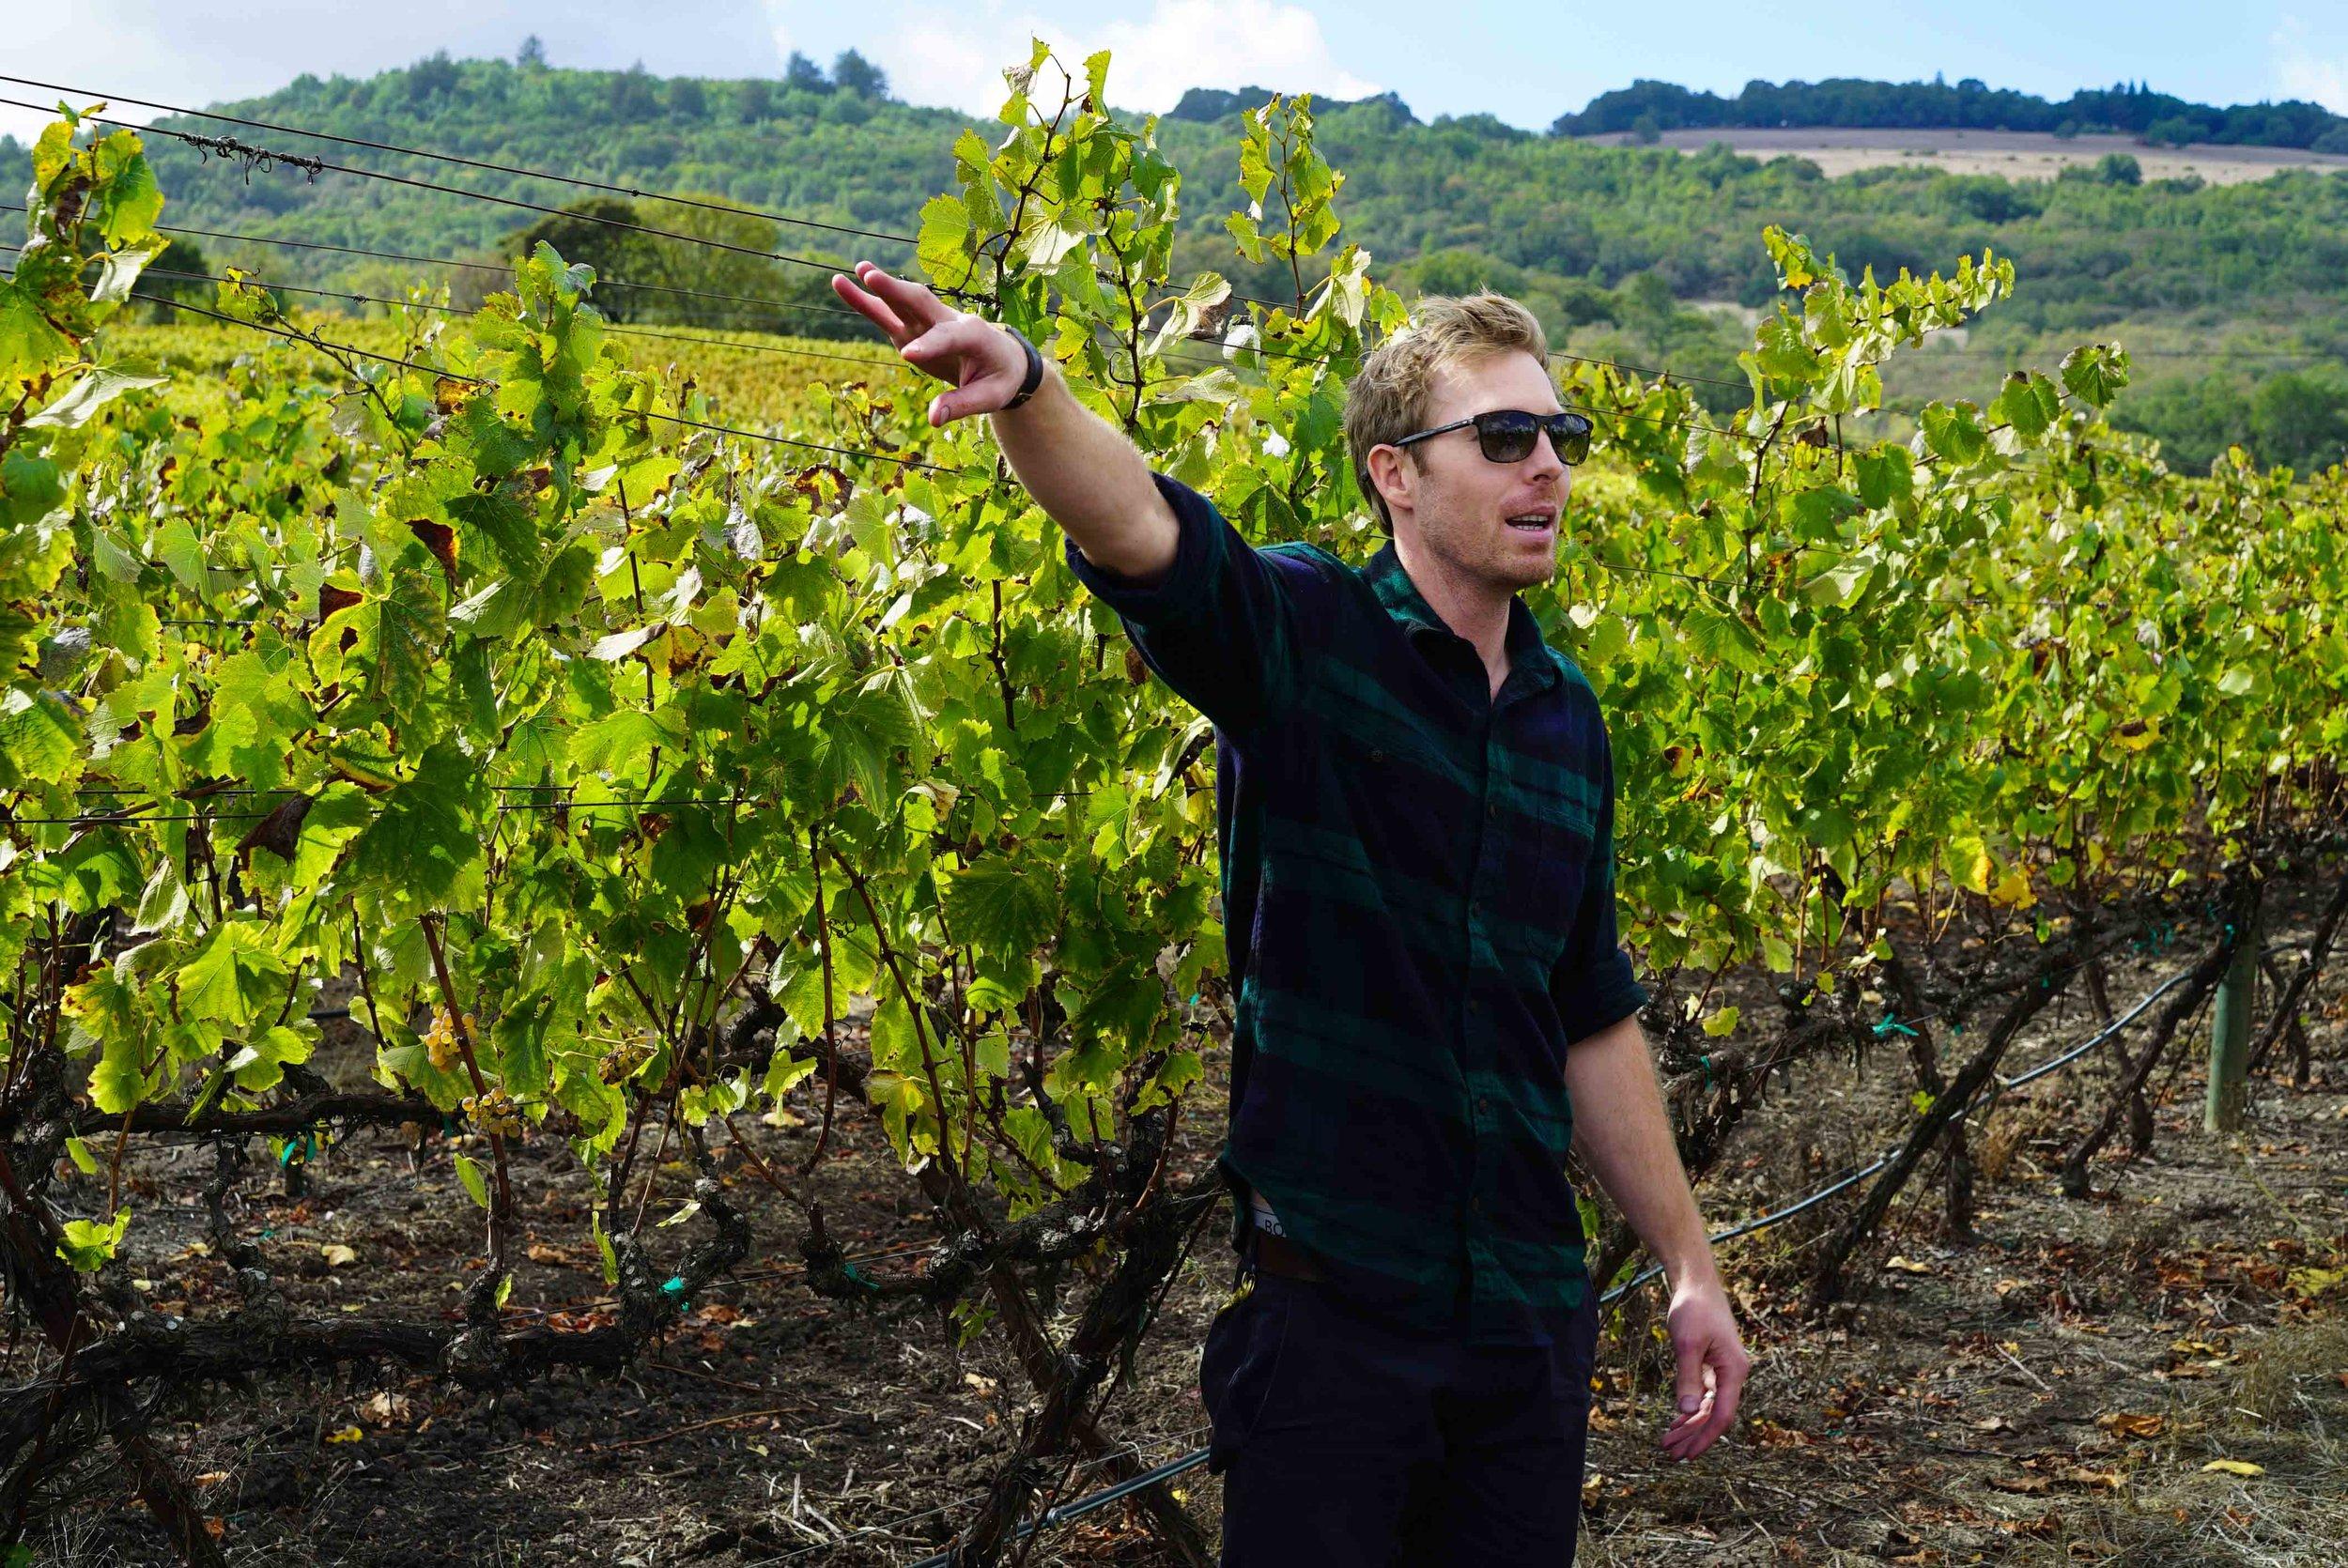 Blair giving a tour of the Farina Vineyard on Sonoma Mountain where his sources his Chardonnay.